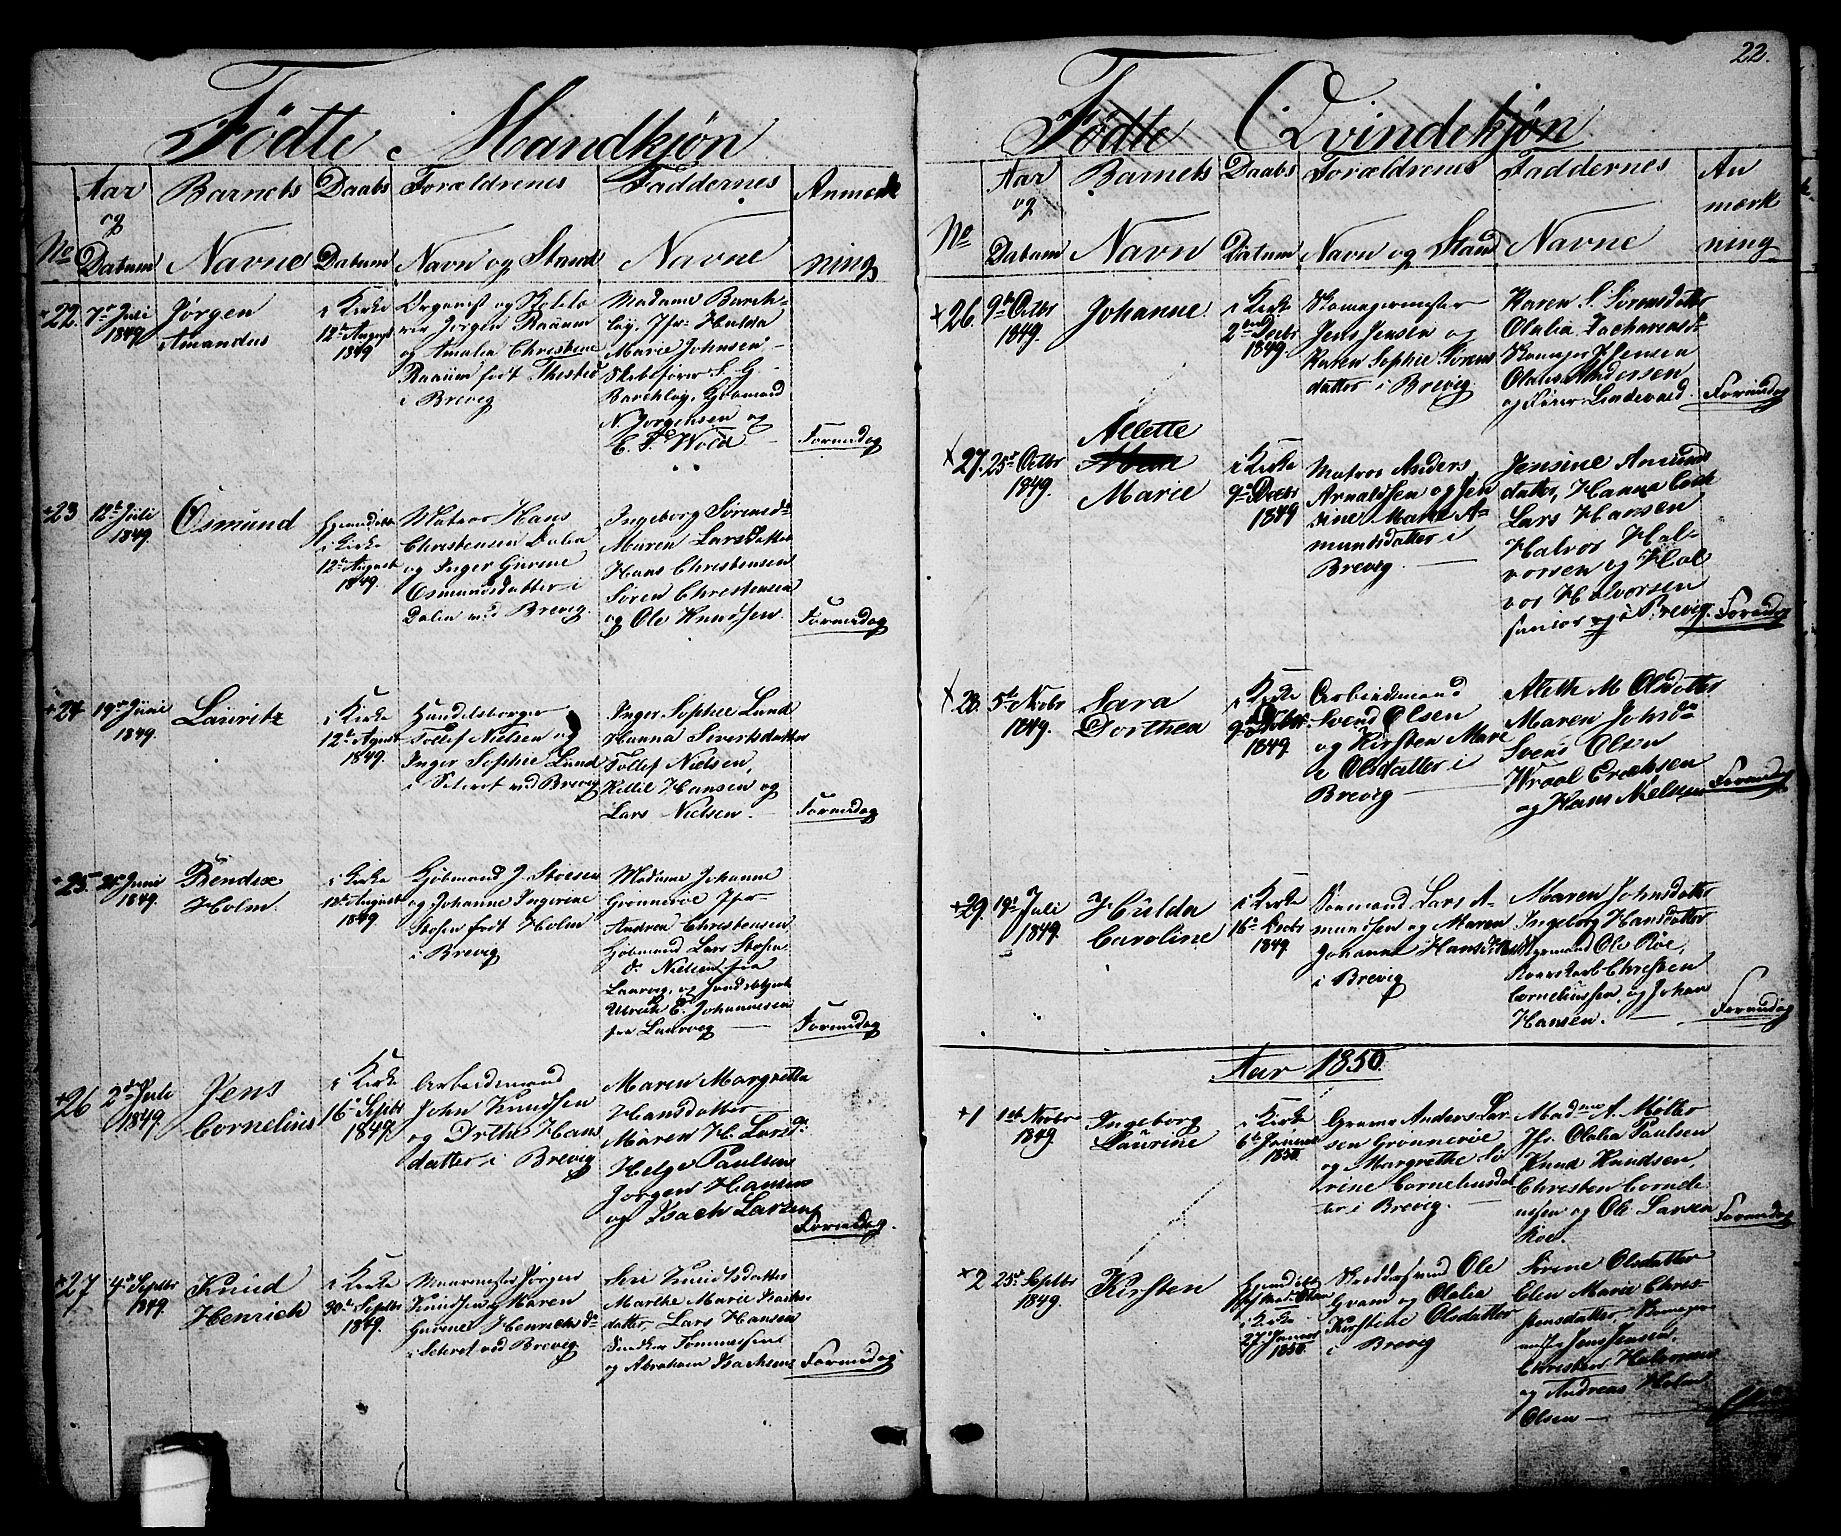 SAKO, Brevik kirkebøker, G/Ga/L0002: Klokkerbok nr. 2, 1846-1865, s. 22